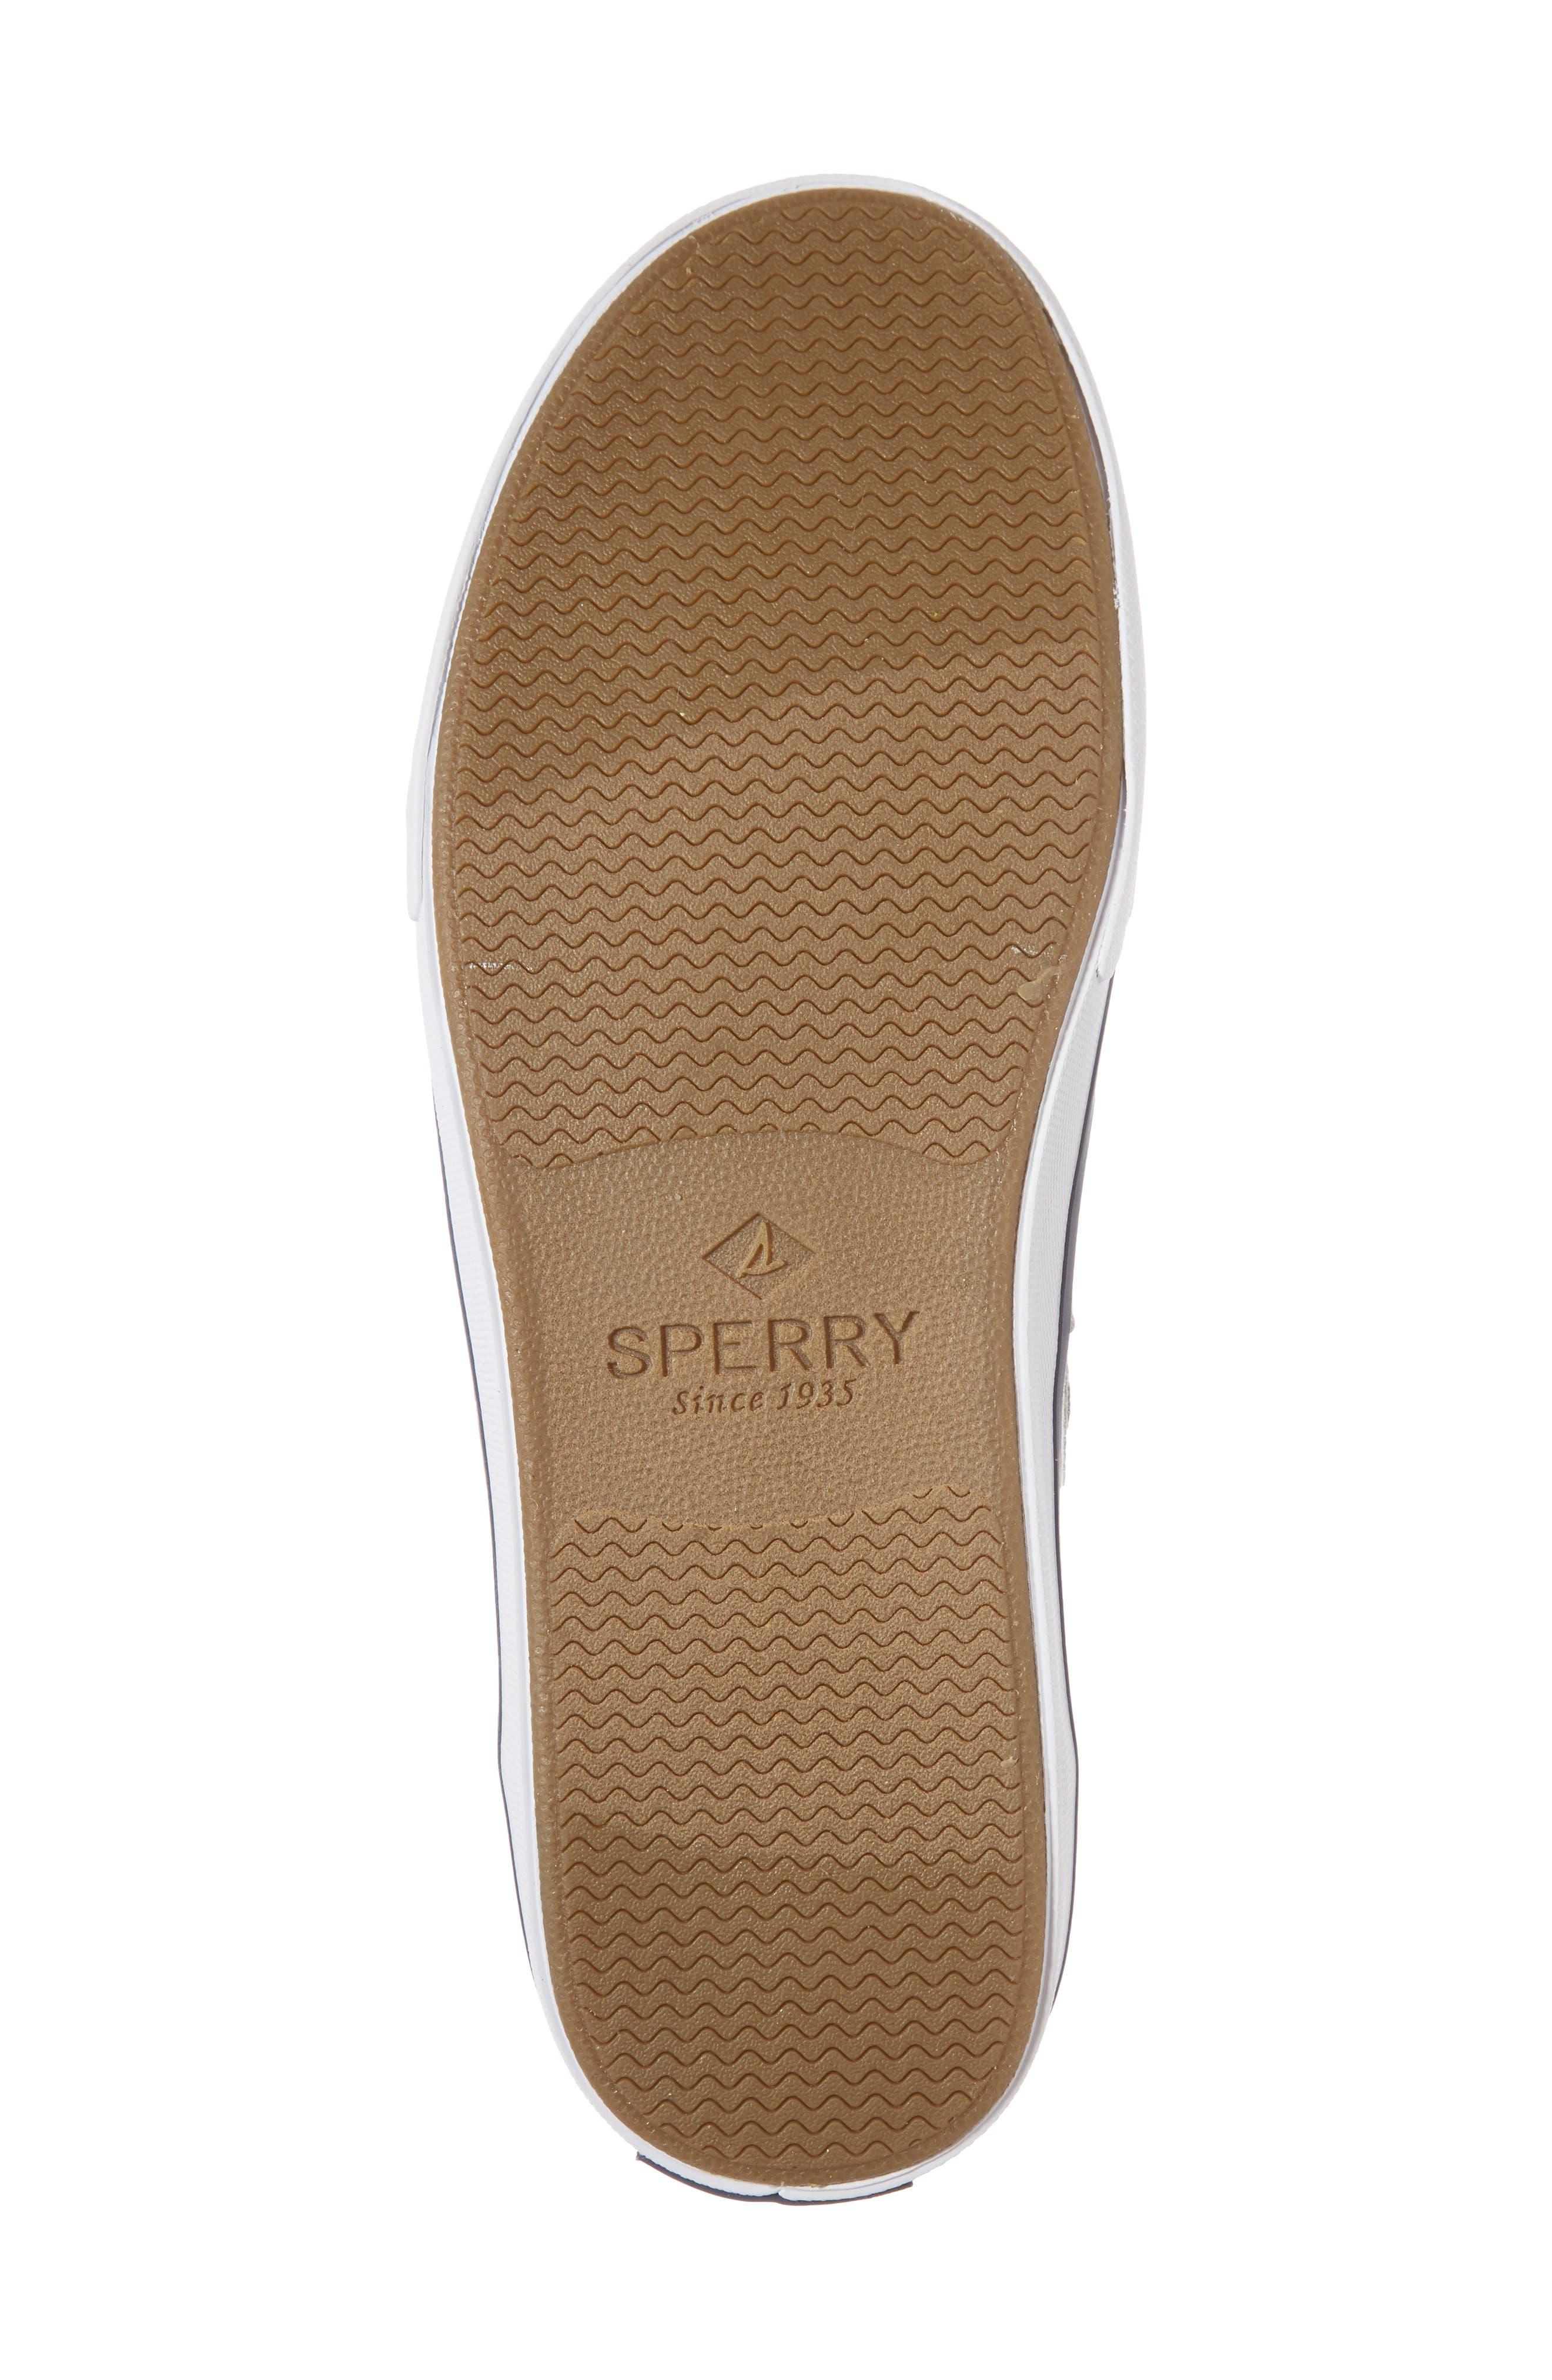 SPERRY, Striper 2 Boat Shoe, Alternate thumbnail 6, color, GREY CANVAS